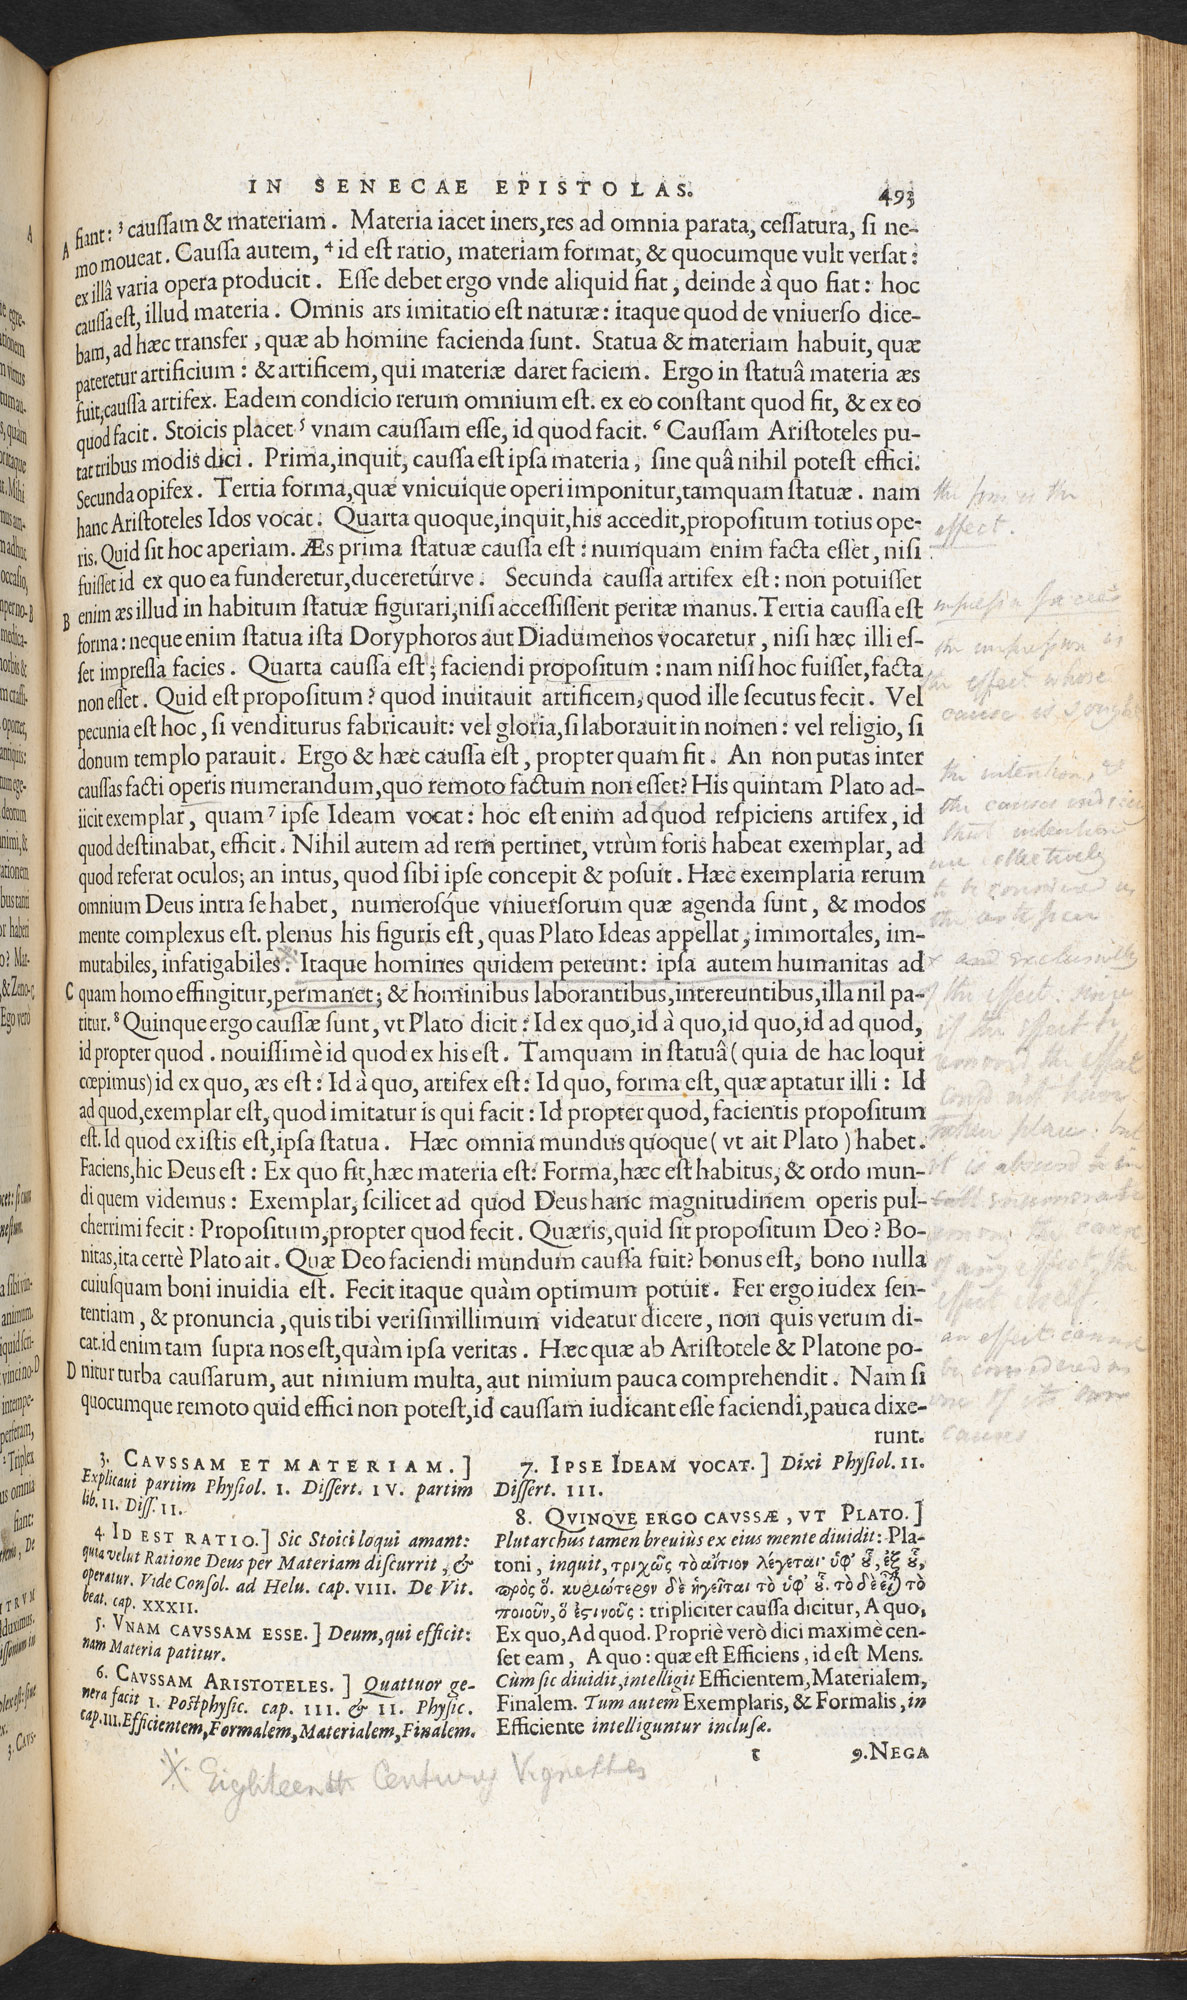 P B Shelley's annotated copy of Seneca's Philosophi Opera